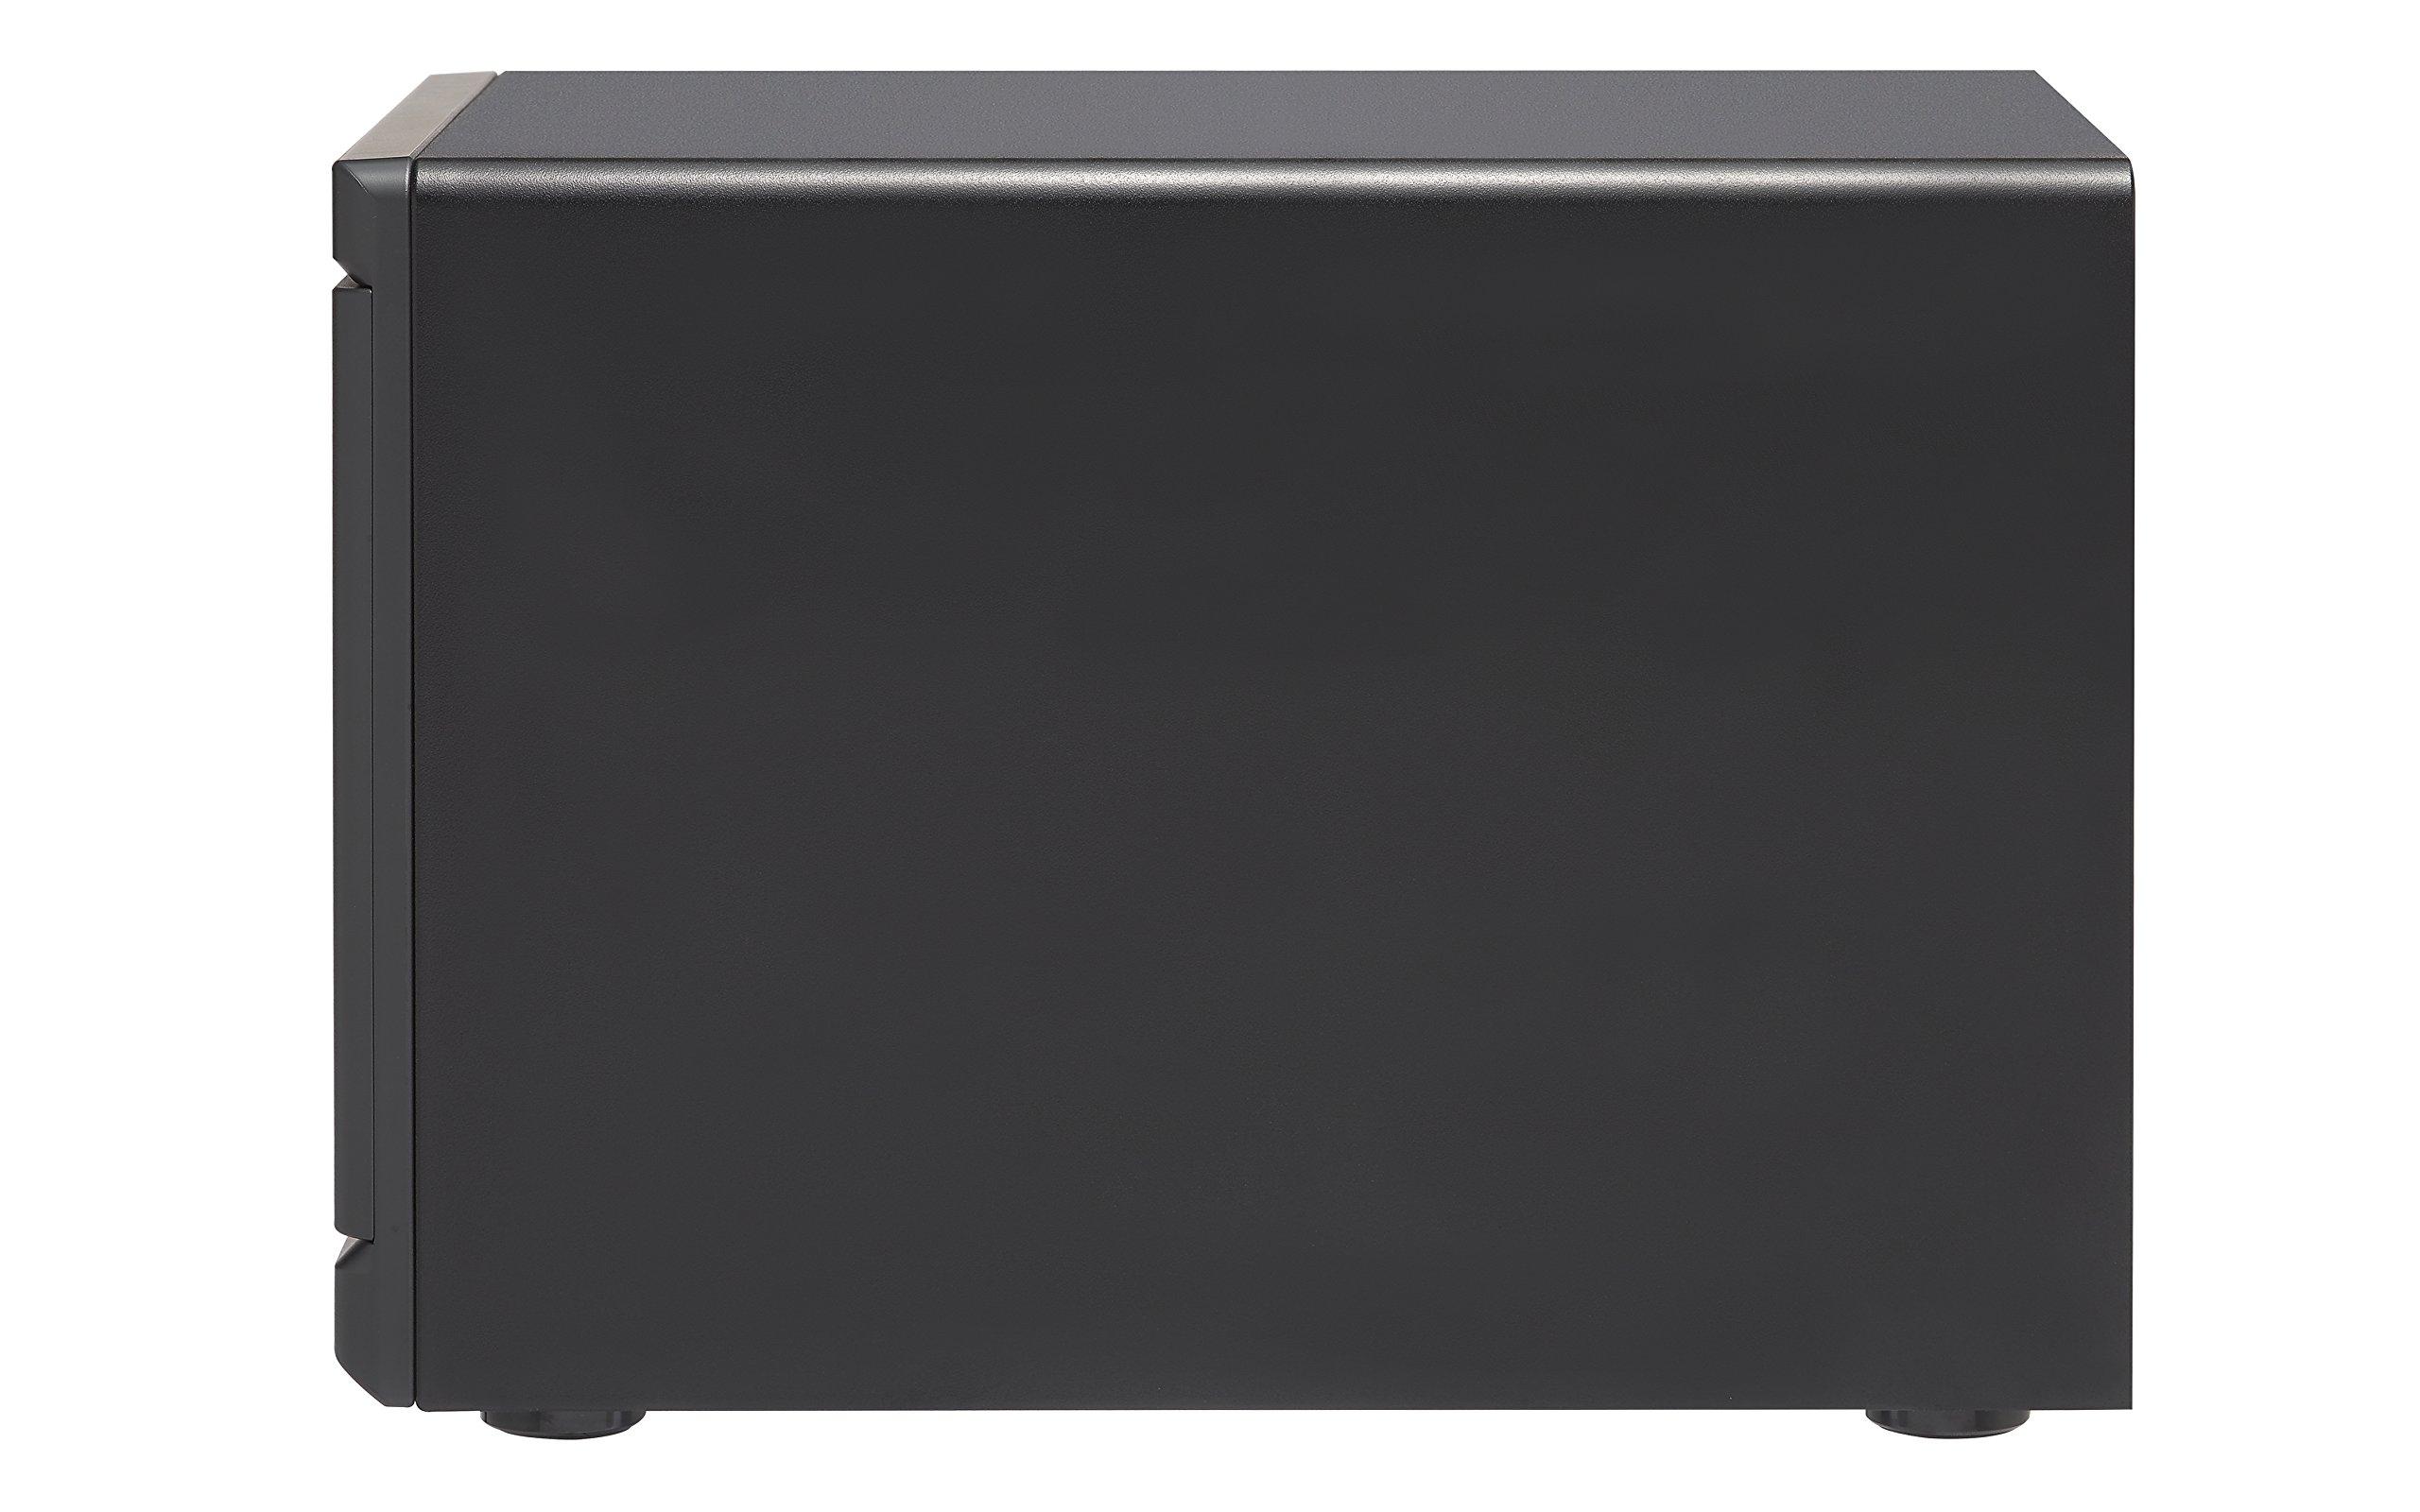 Qnap TVS-1282-i7-64G-US High Performance 12 bay (8+4) NAS/iSCSI IP-SAN, Intel Skylake Core i7-6700 3.4 GHz Quad Core, 32GB RAM, 10G-ready by QNAP (Image #4)